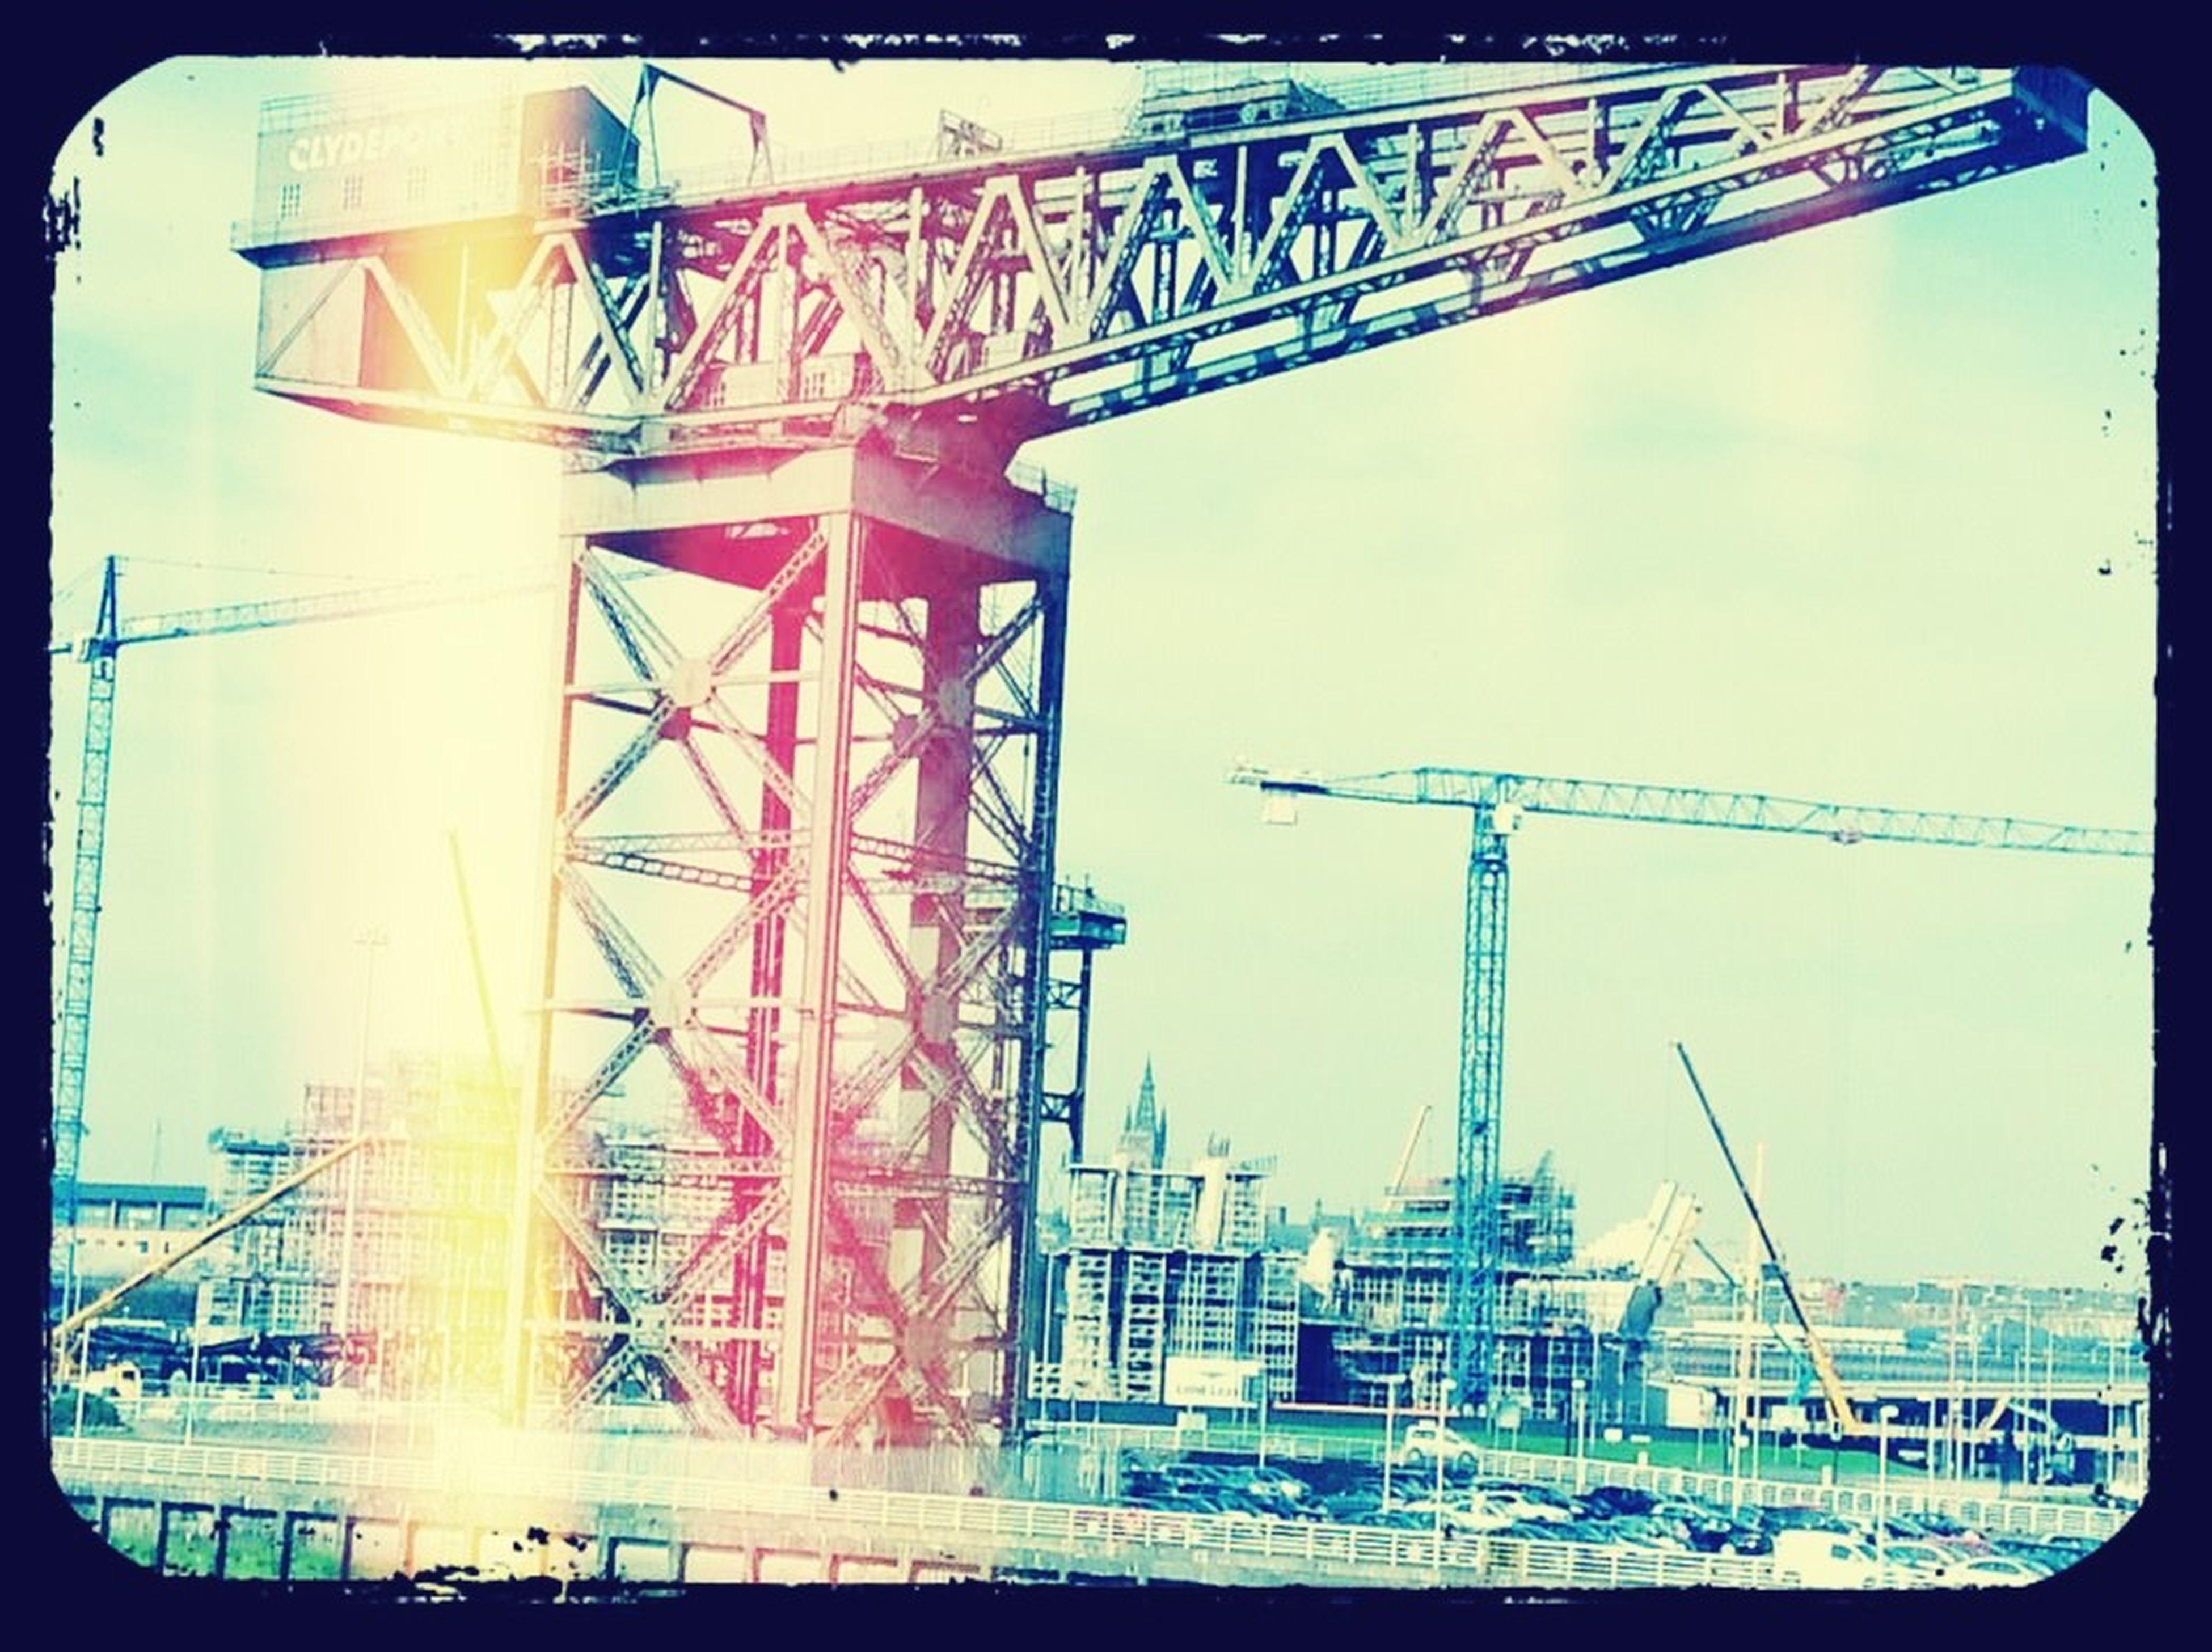 Clyde built. Glasgow  Clydeside Clyde Built Glasgow Crane